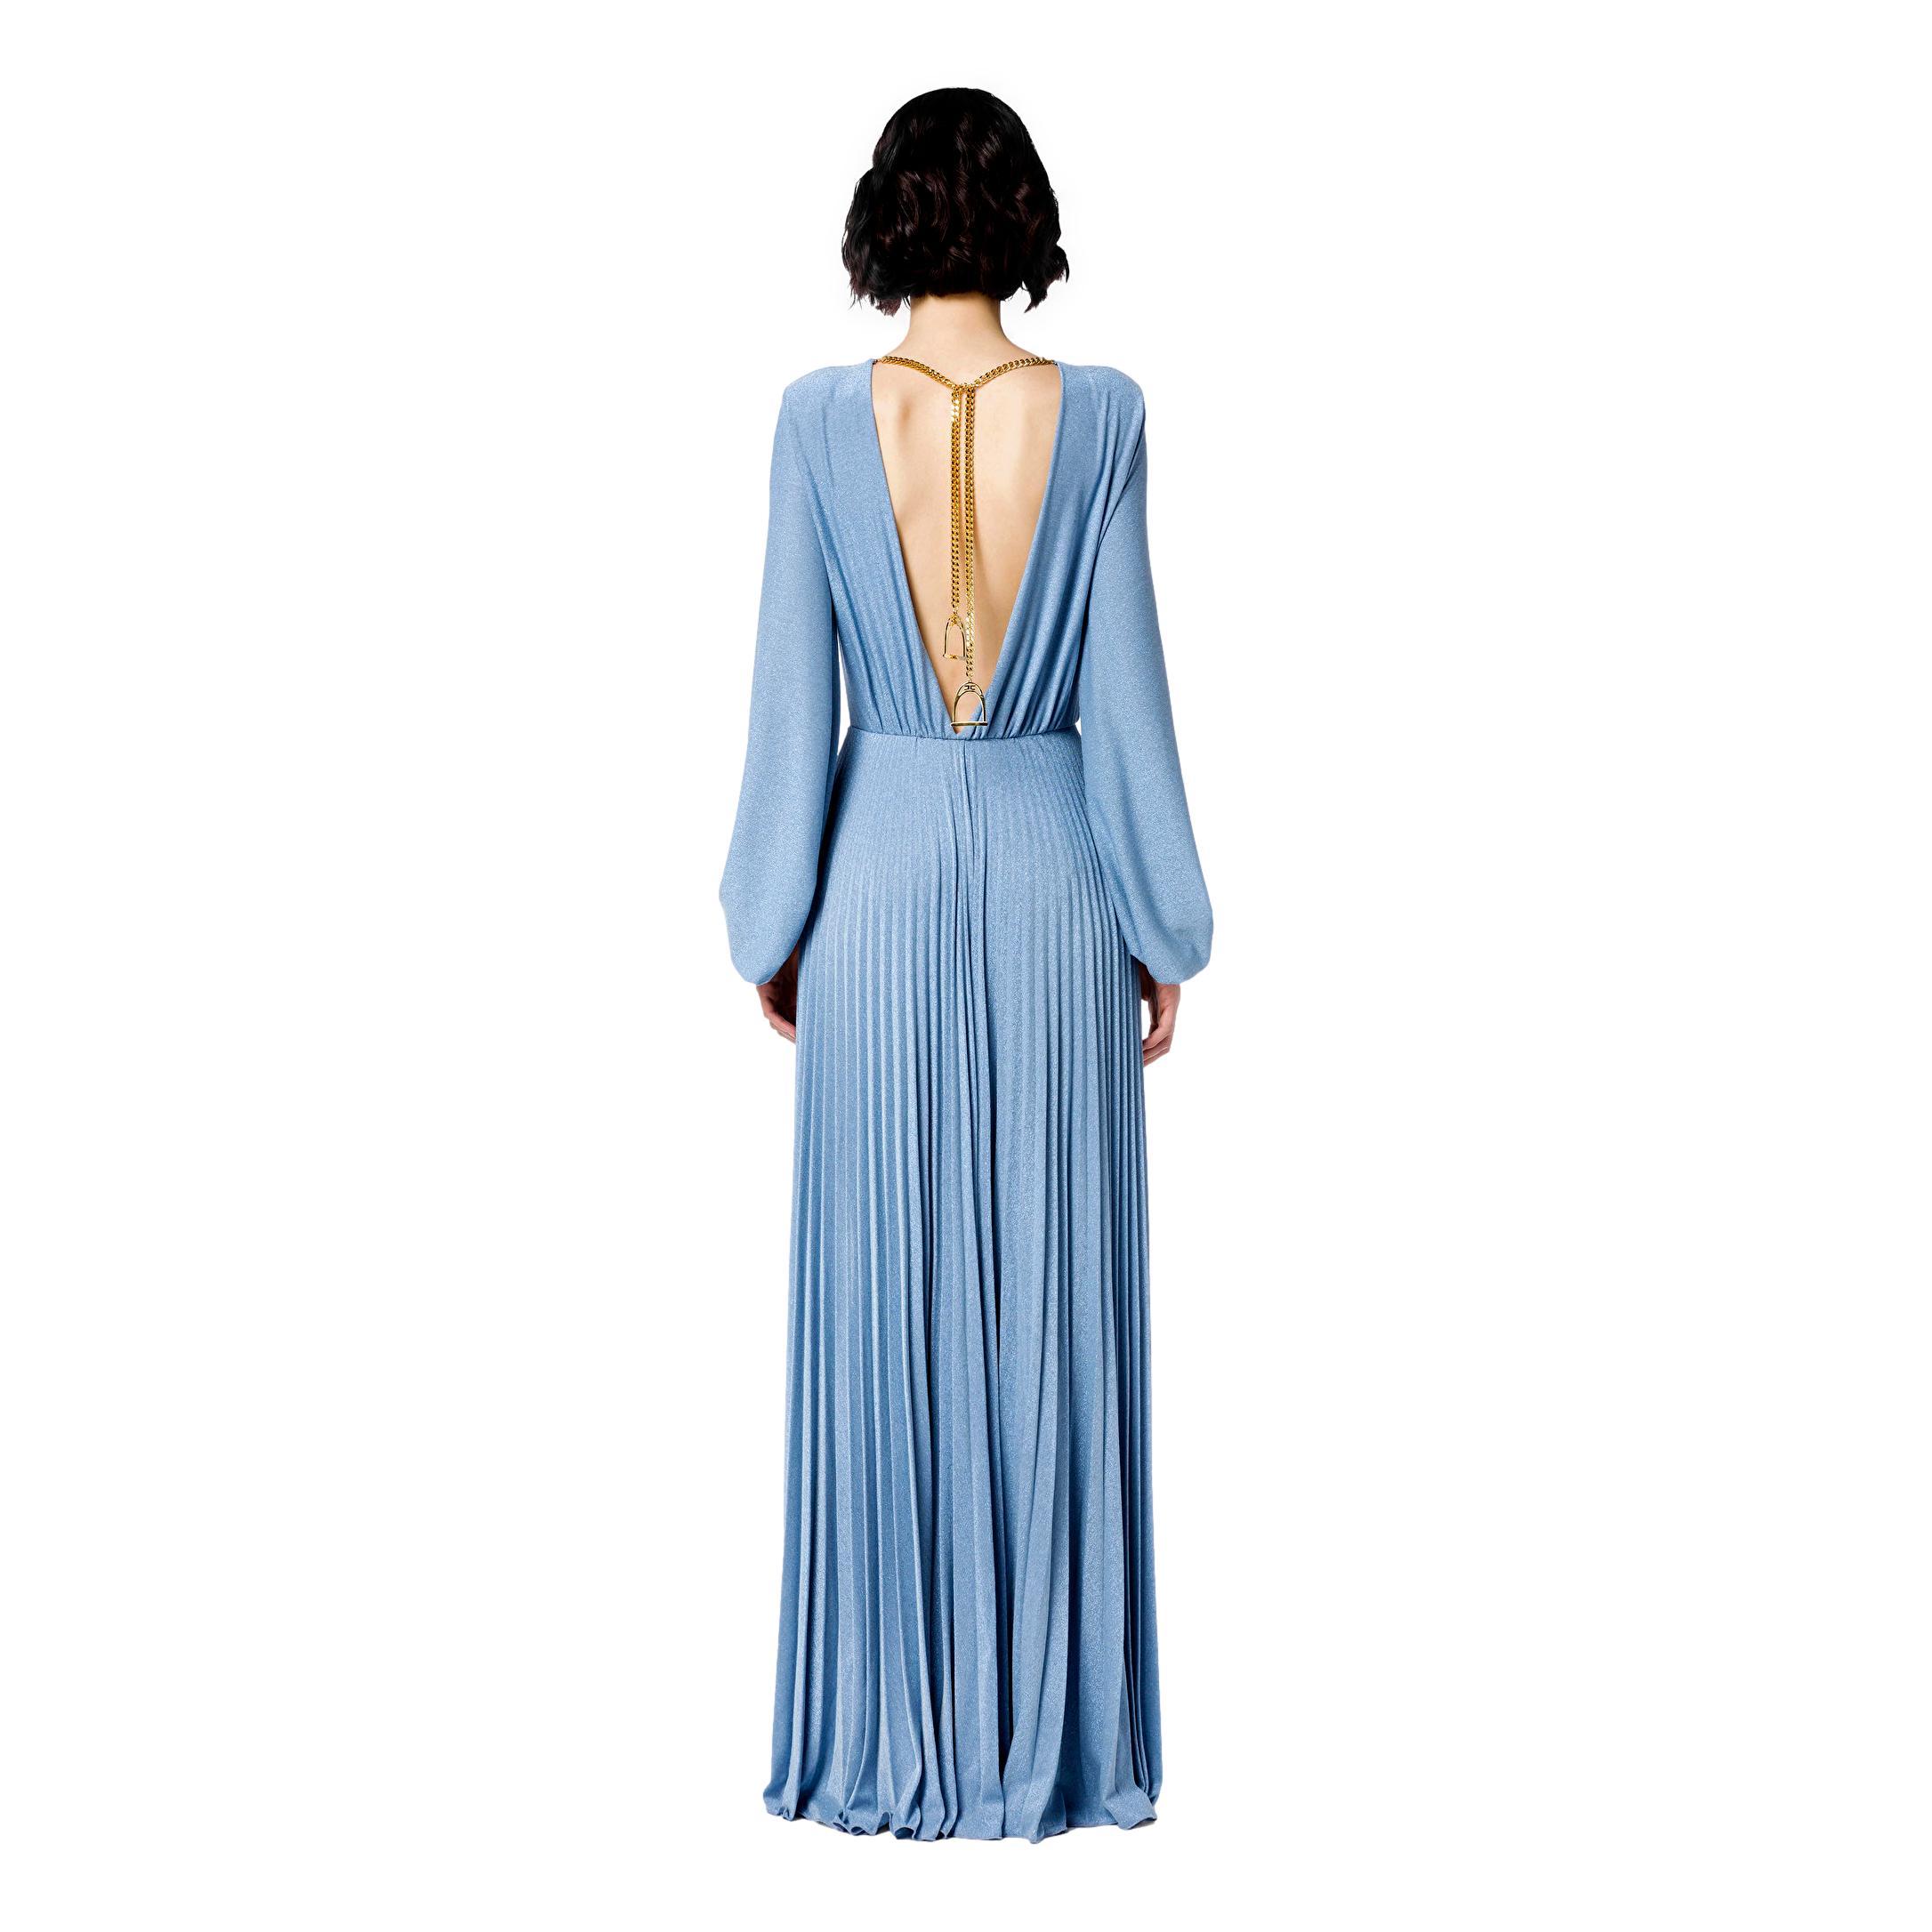 Red Carpet pleated dress with light gold stirrup charm ELISABETTA FRANCHI |  | AB05816E2Q80